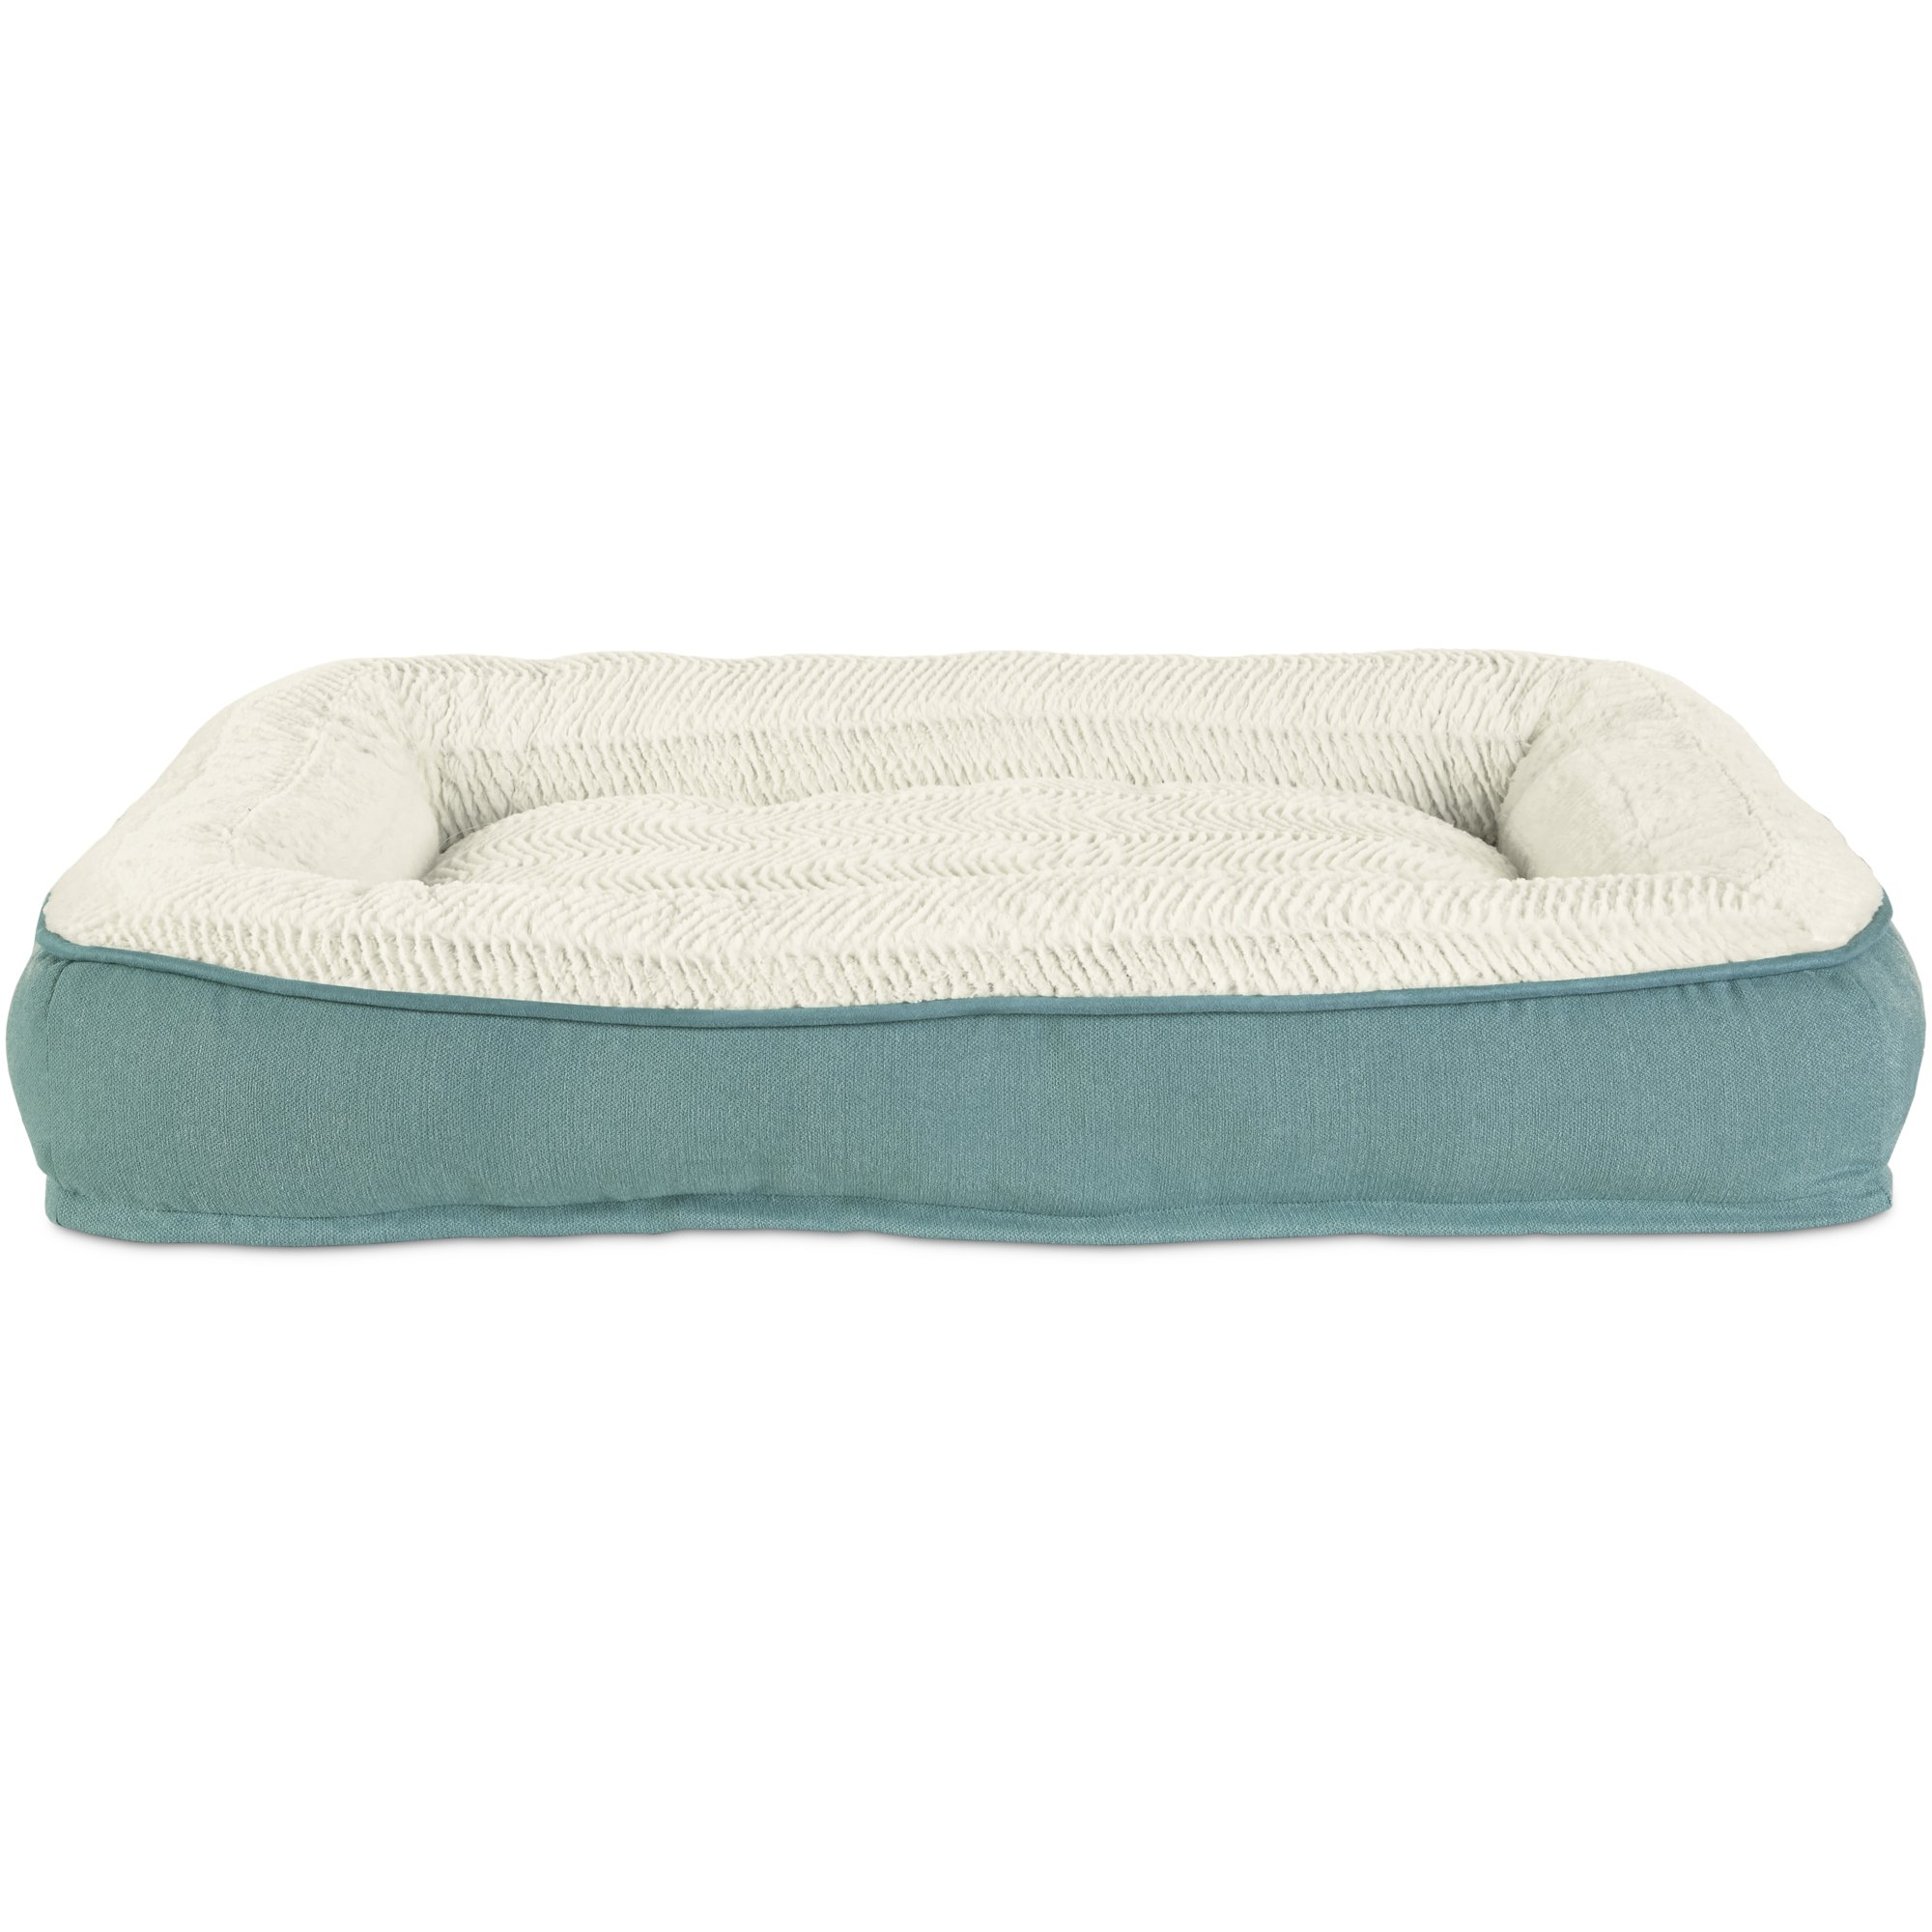 height flex comforter aqua products pump customers format pro heat comfort vaillant purpose heating ecotec